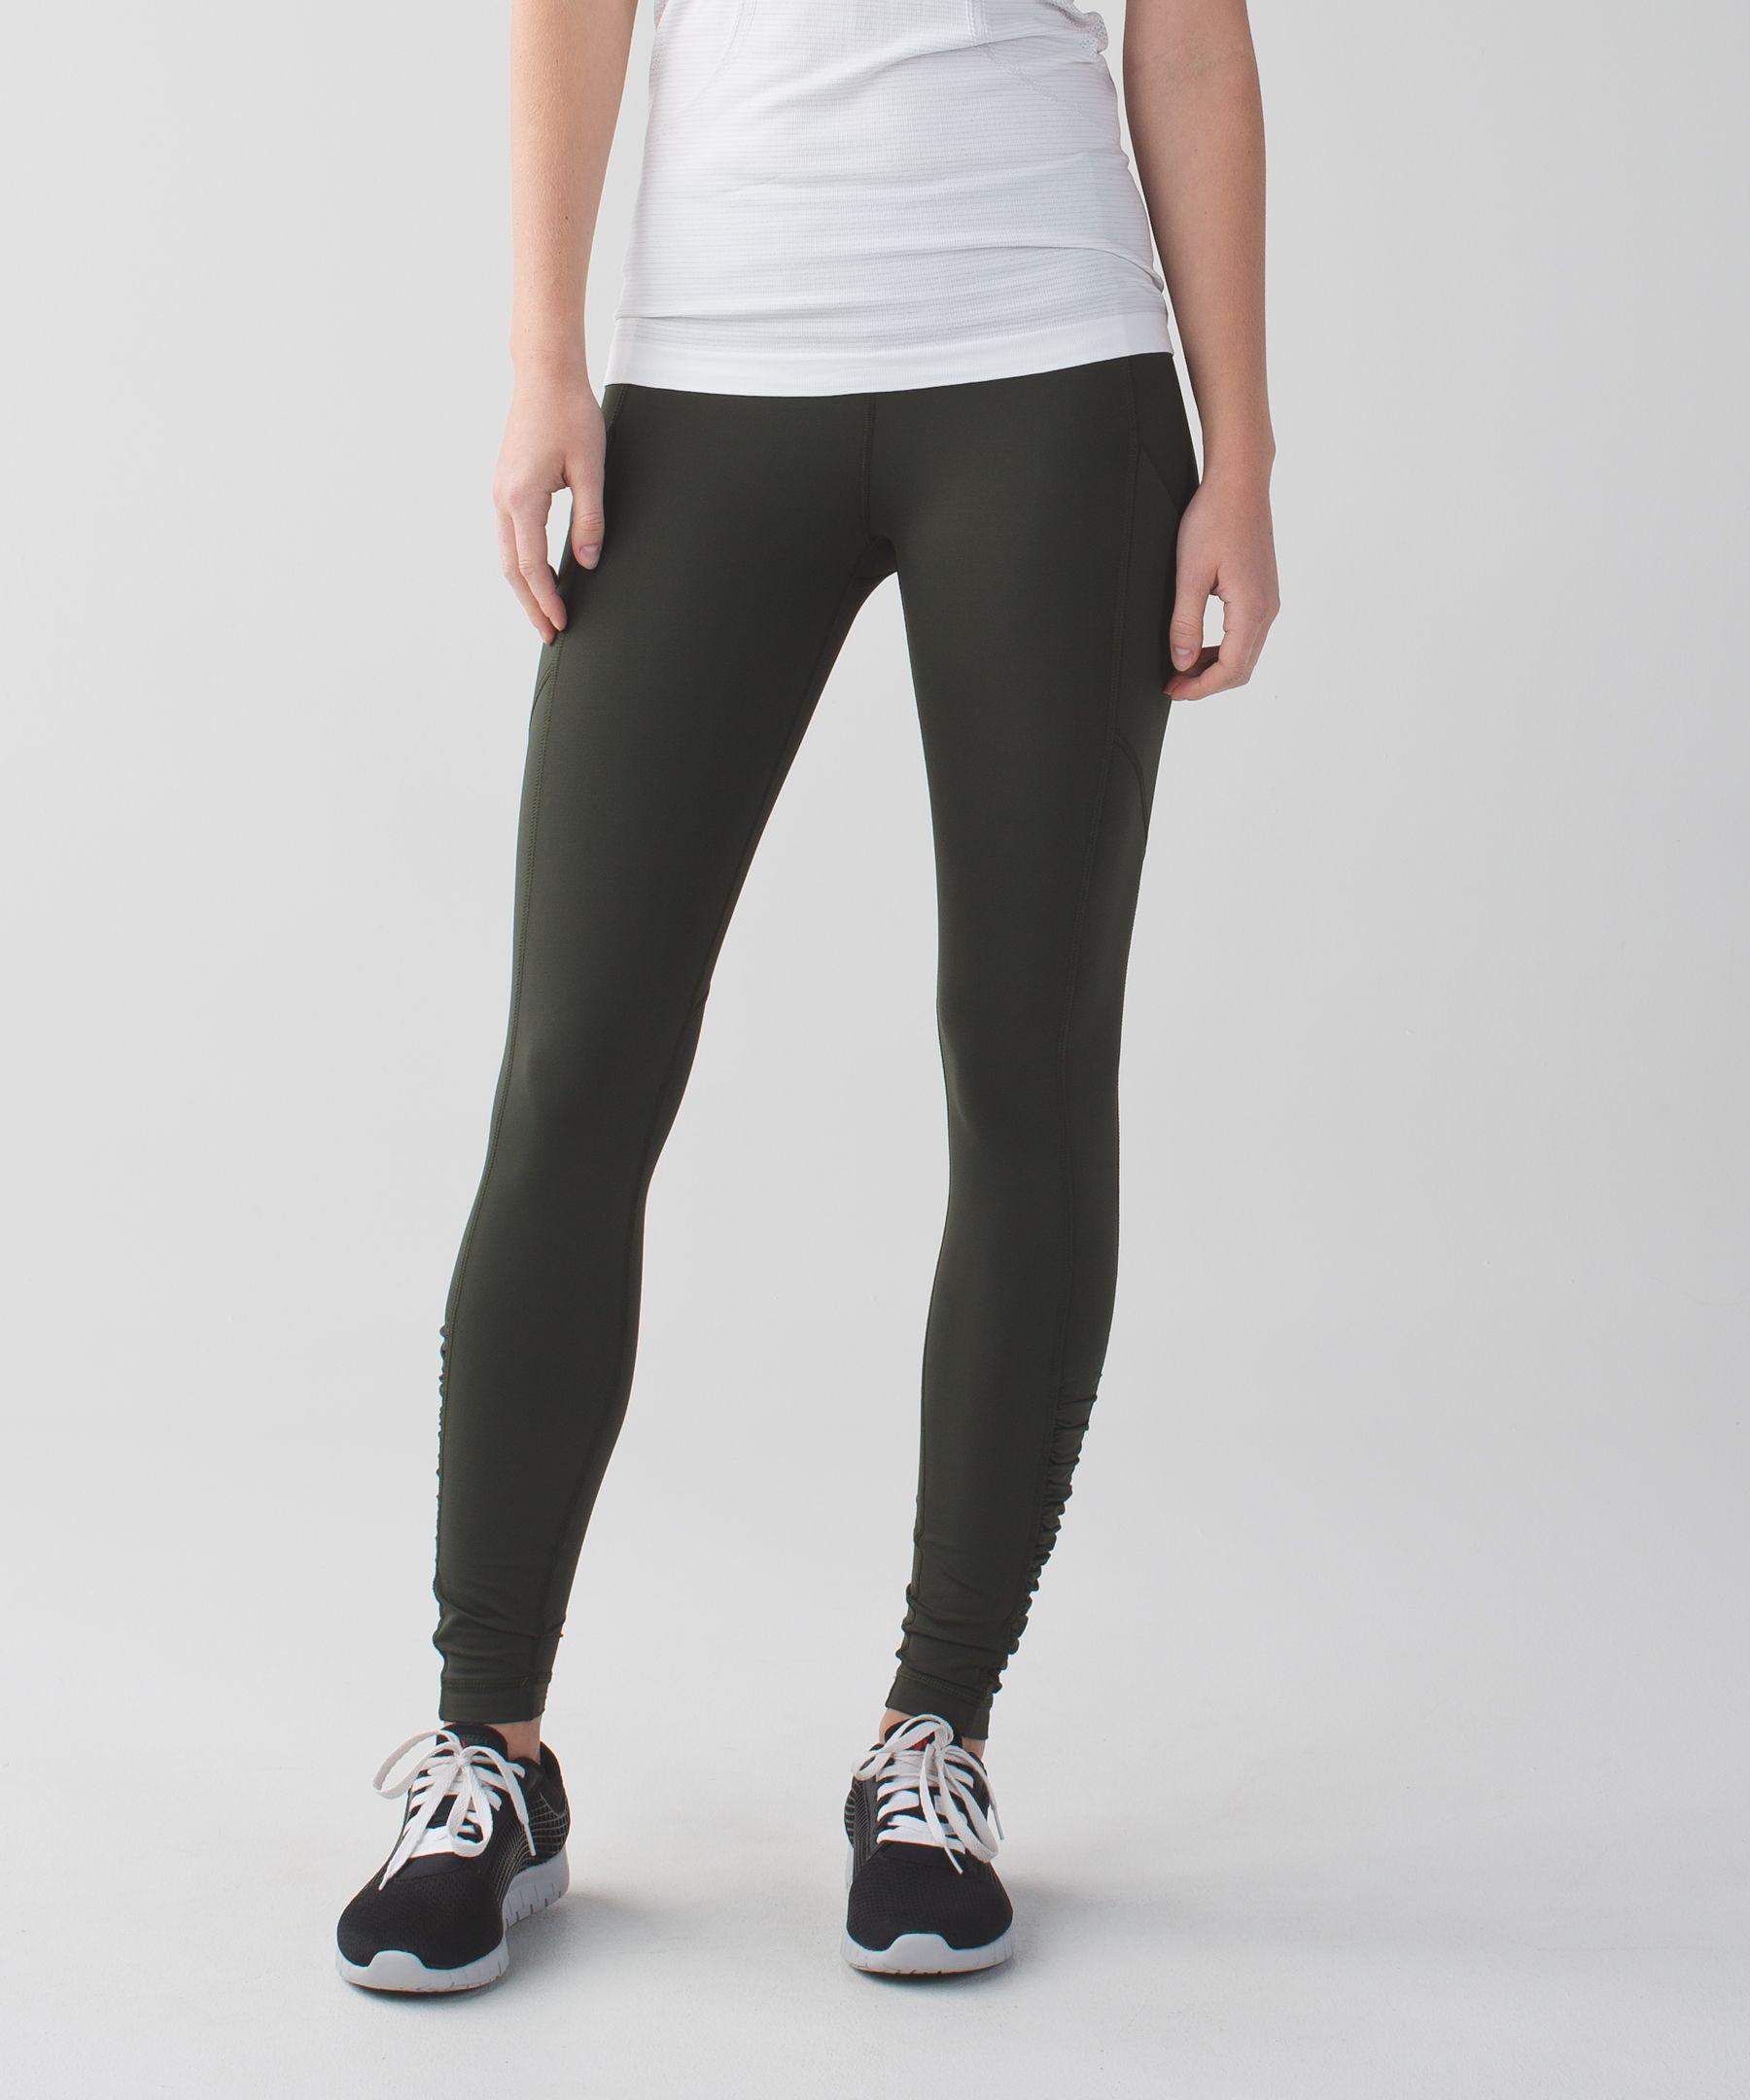 Women's Running Pants